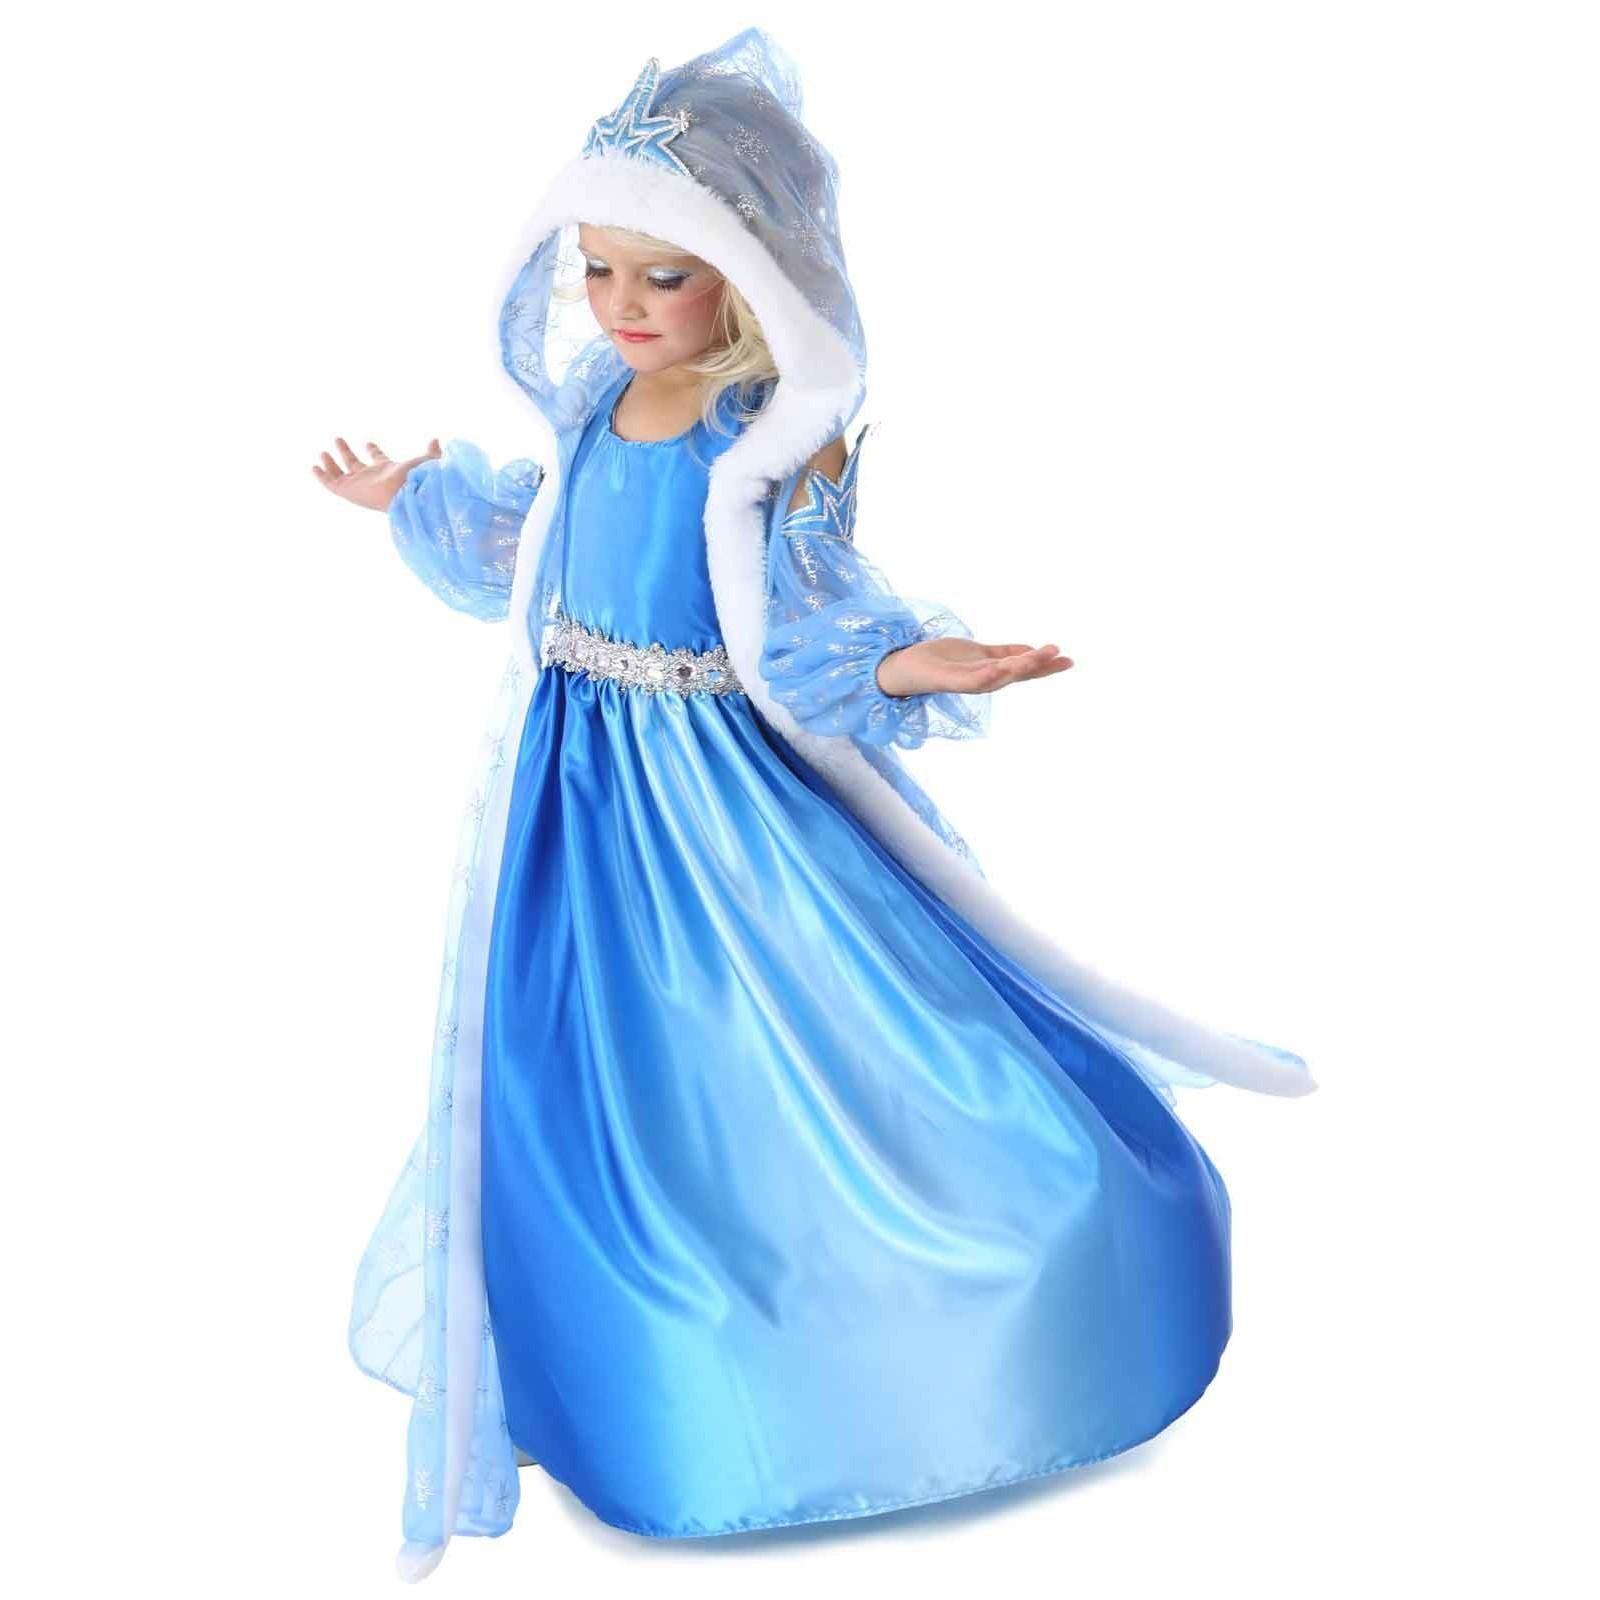 Modest Girls Frozen Elsa Coronation Snow Queen Princess Costume Party Dress And Cape Costumes